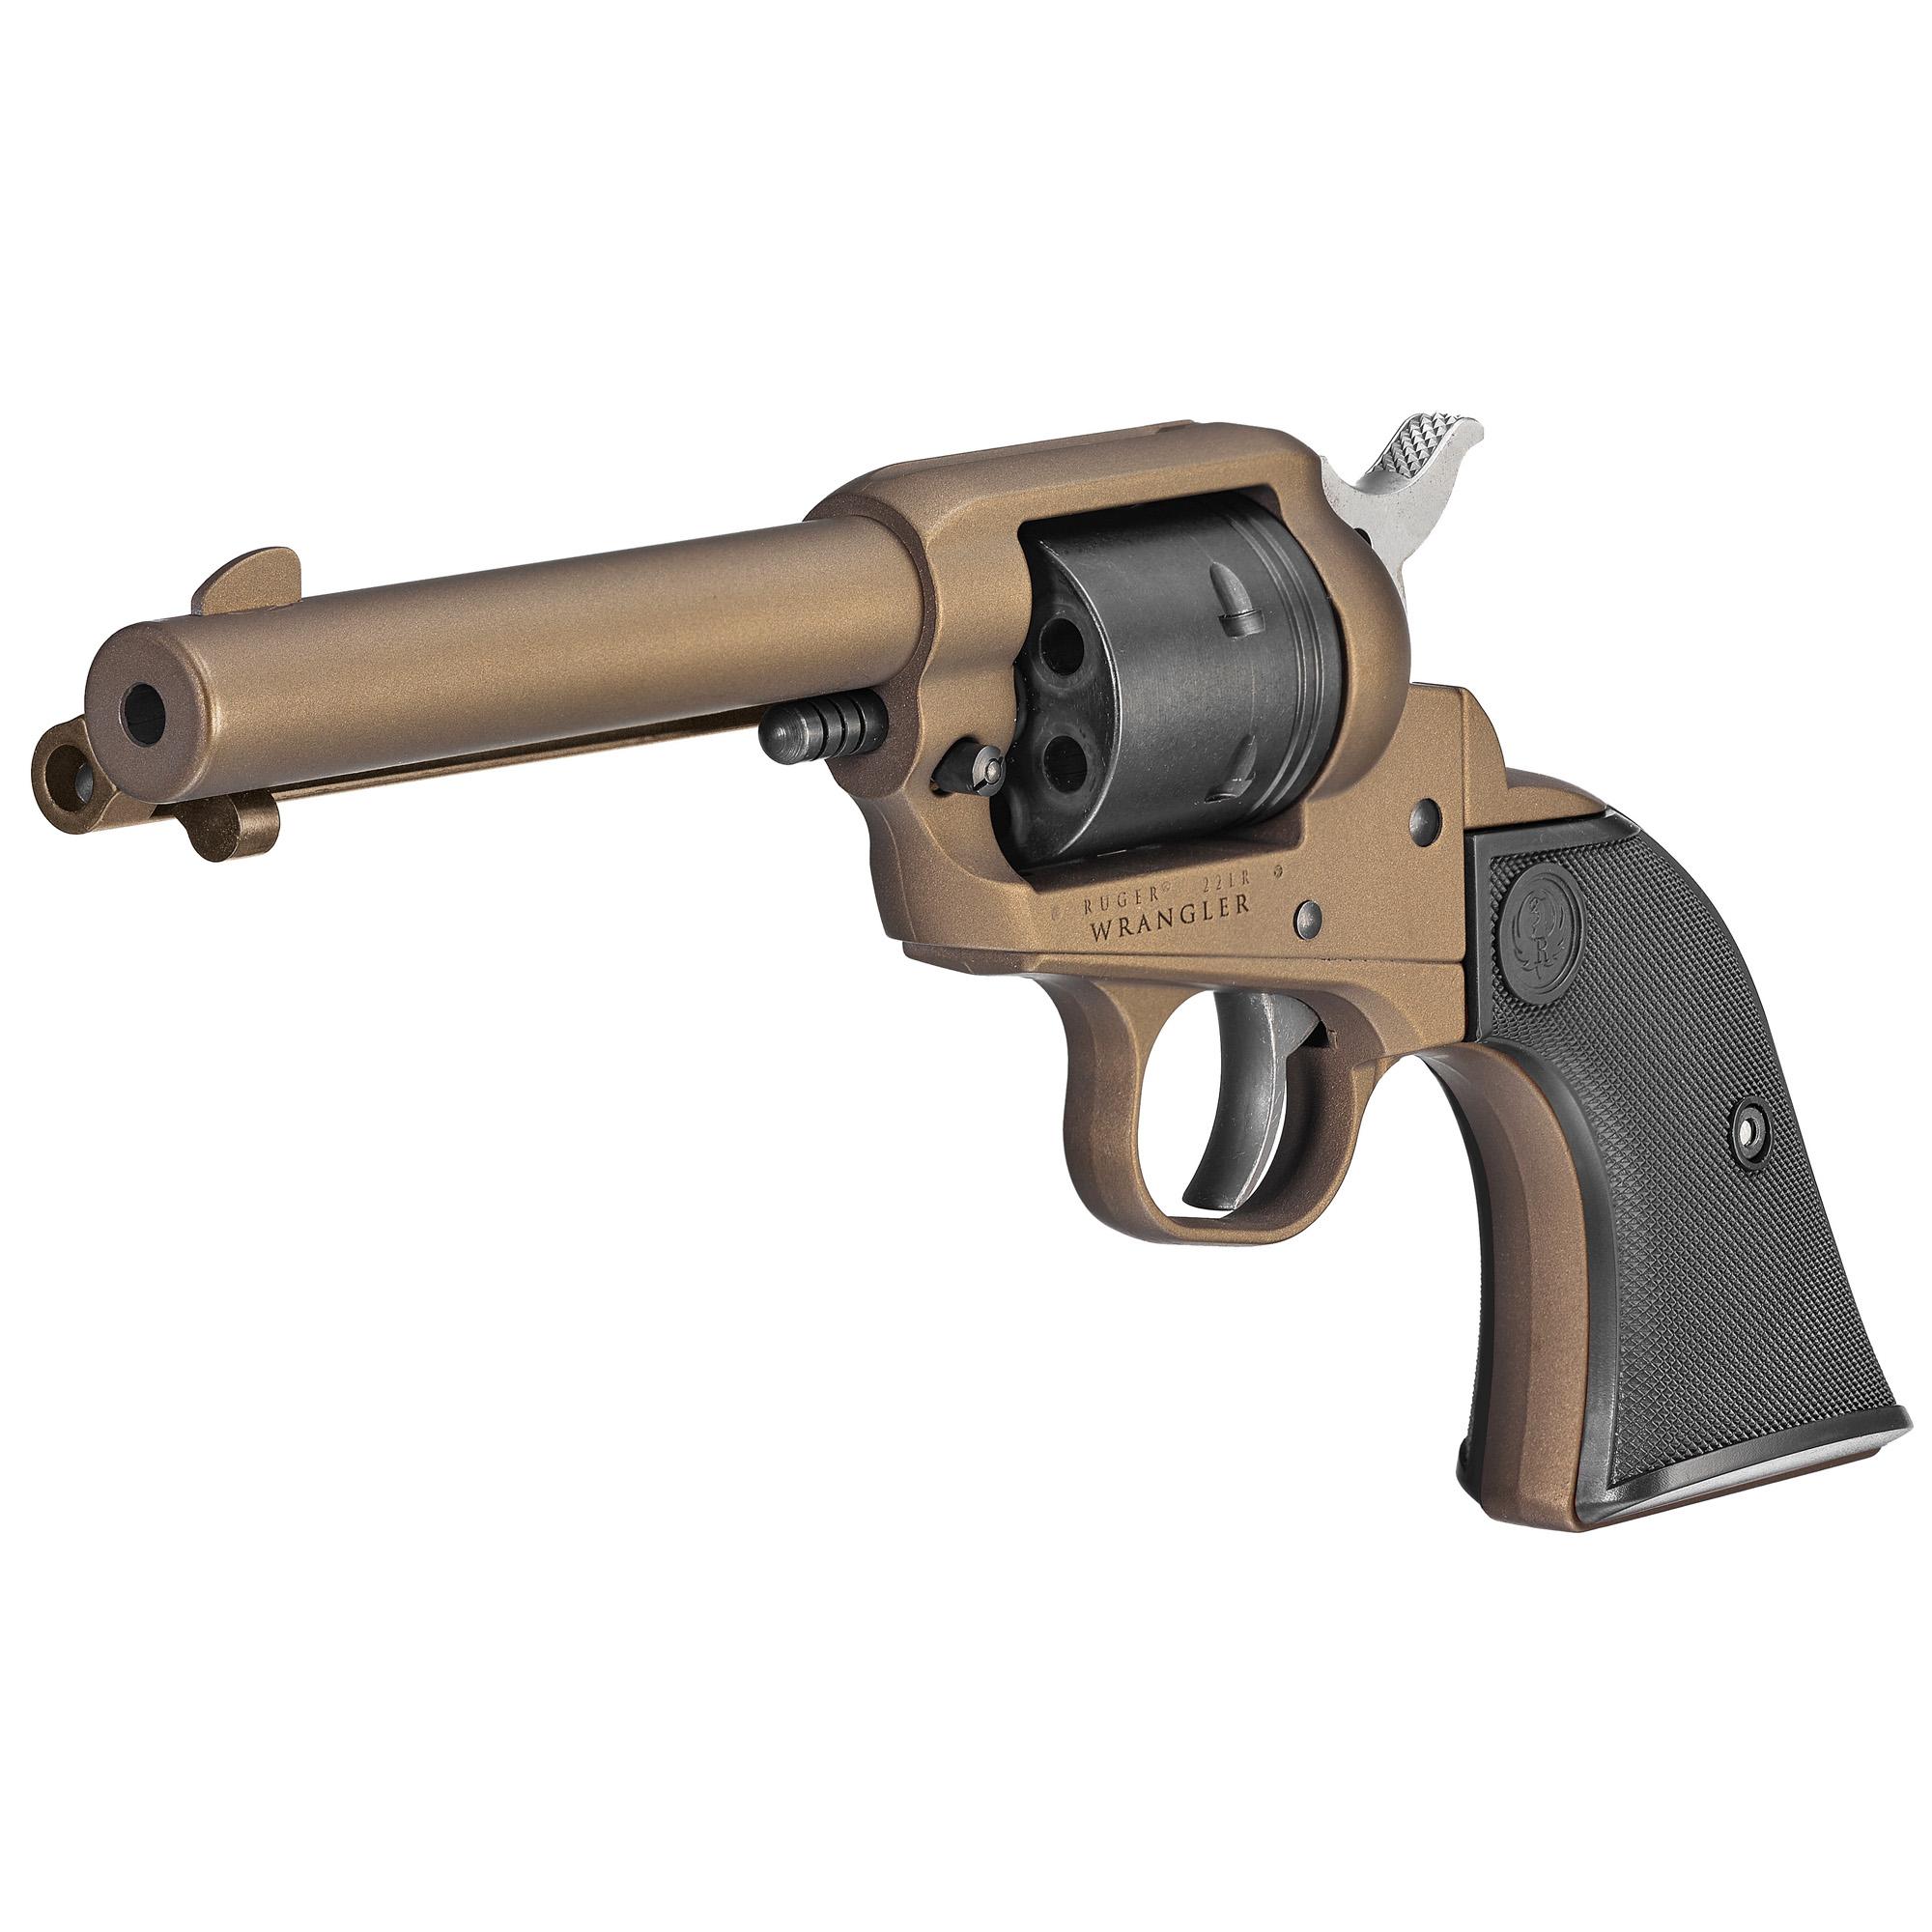 Ruger Wrangler 22LR Single Action Revolver · DK Firearms